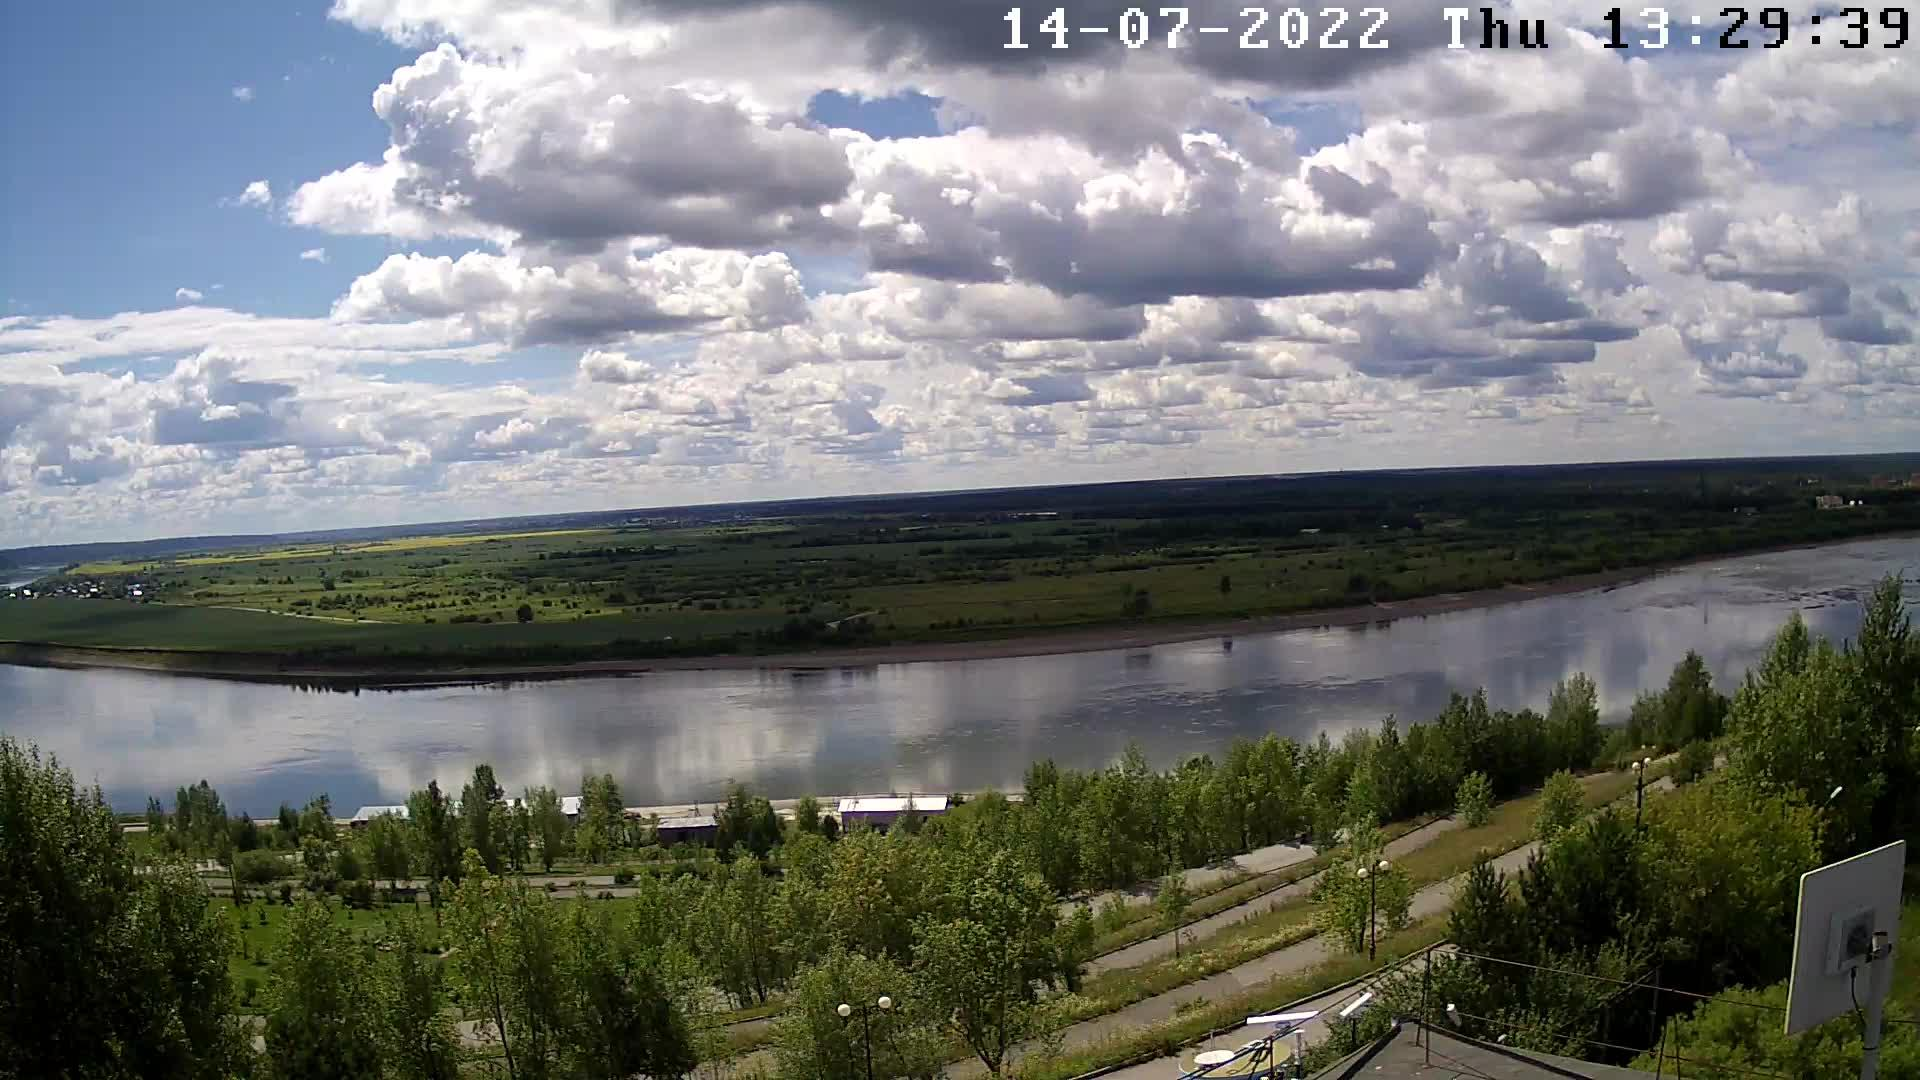 Webcam Tomsk: Трансляция реки Томь − ул. Вершинина,